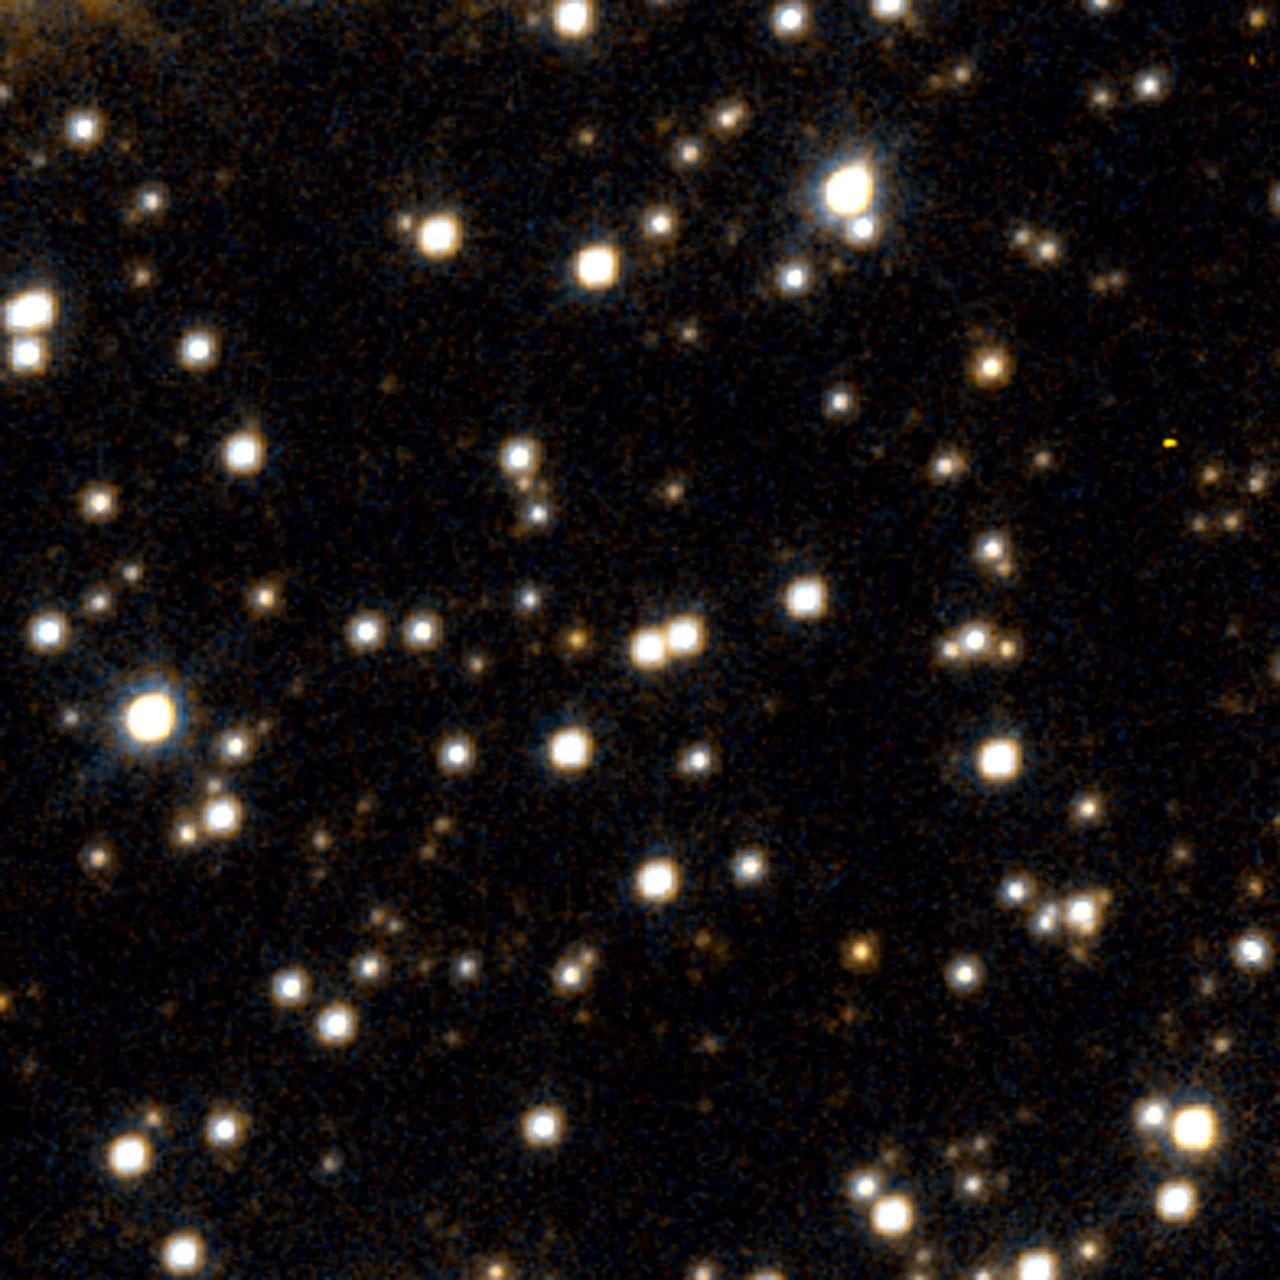 Black Holes Hubble